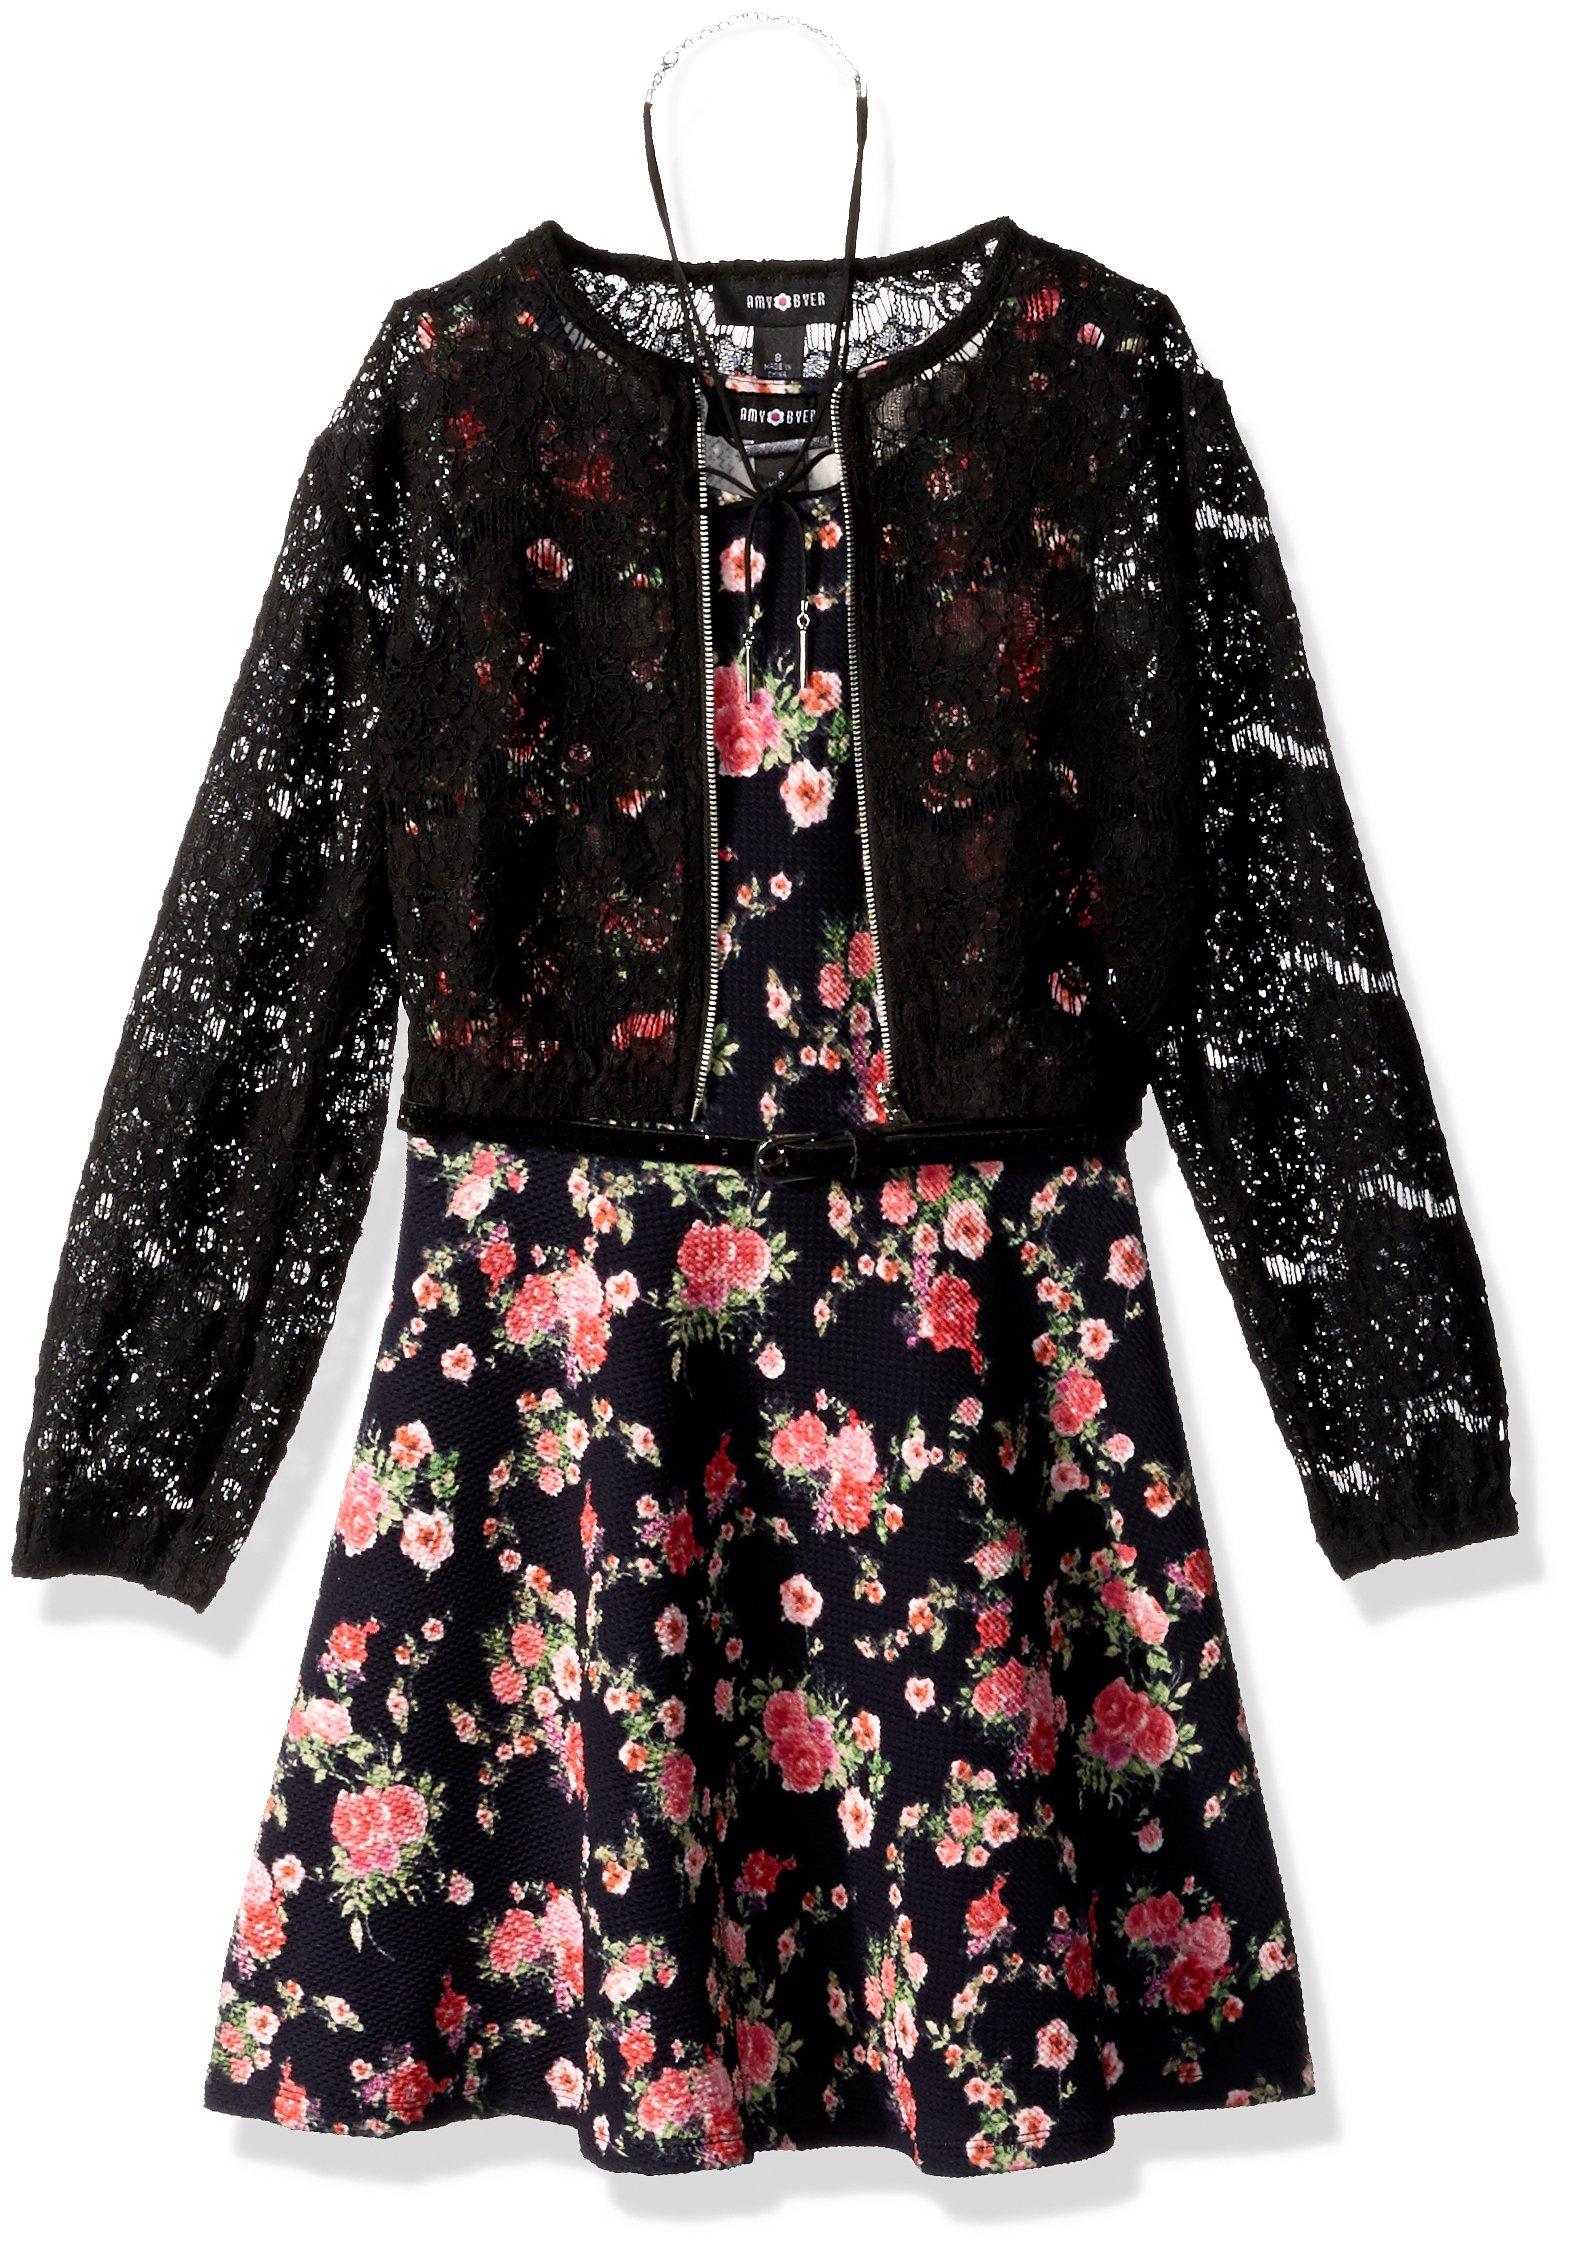 Amy Byer Big Girls' Print Knit Dress with Lace Bomber Jacket, Pat g/Multi, 8 by Amy Byer